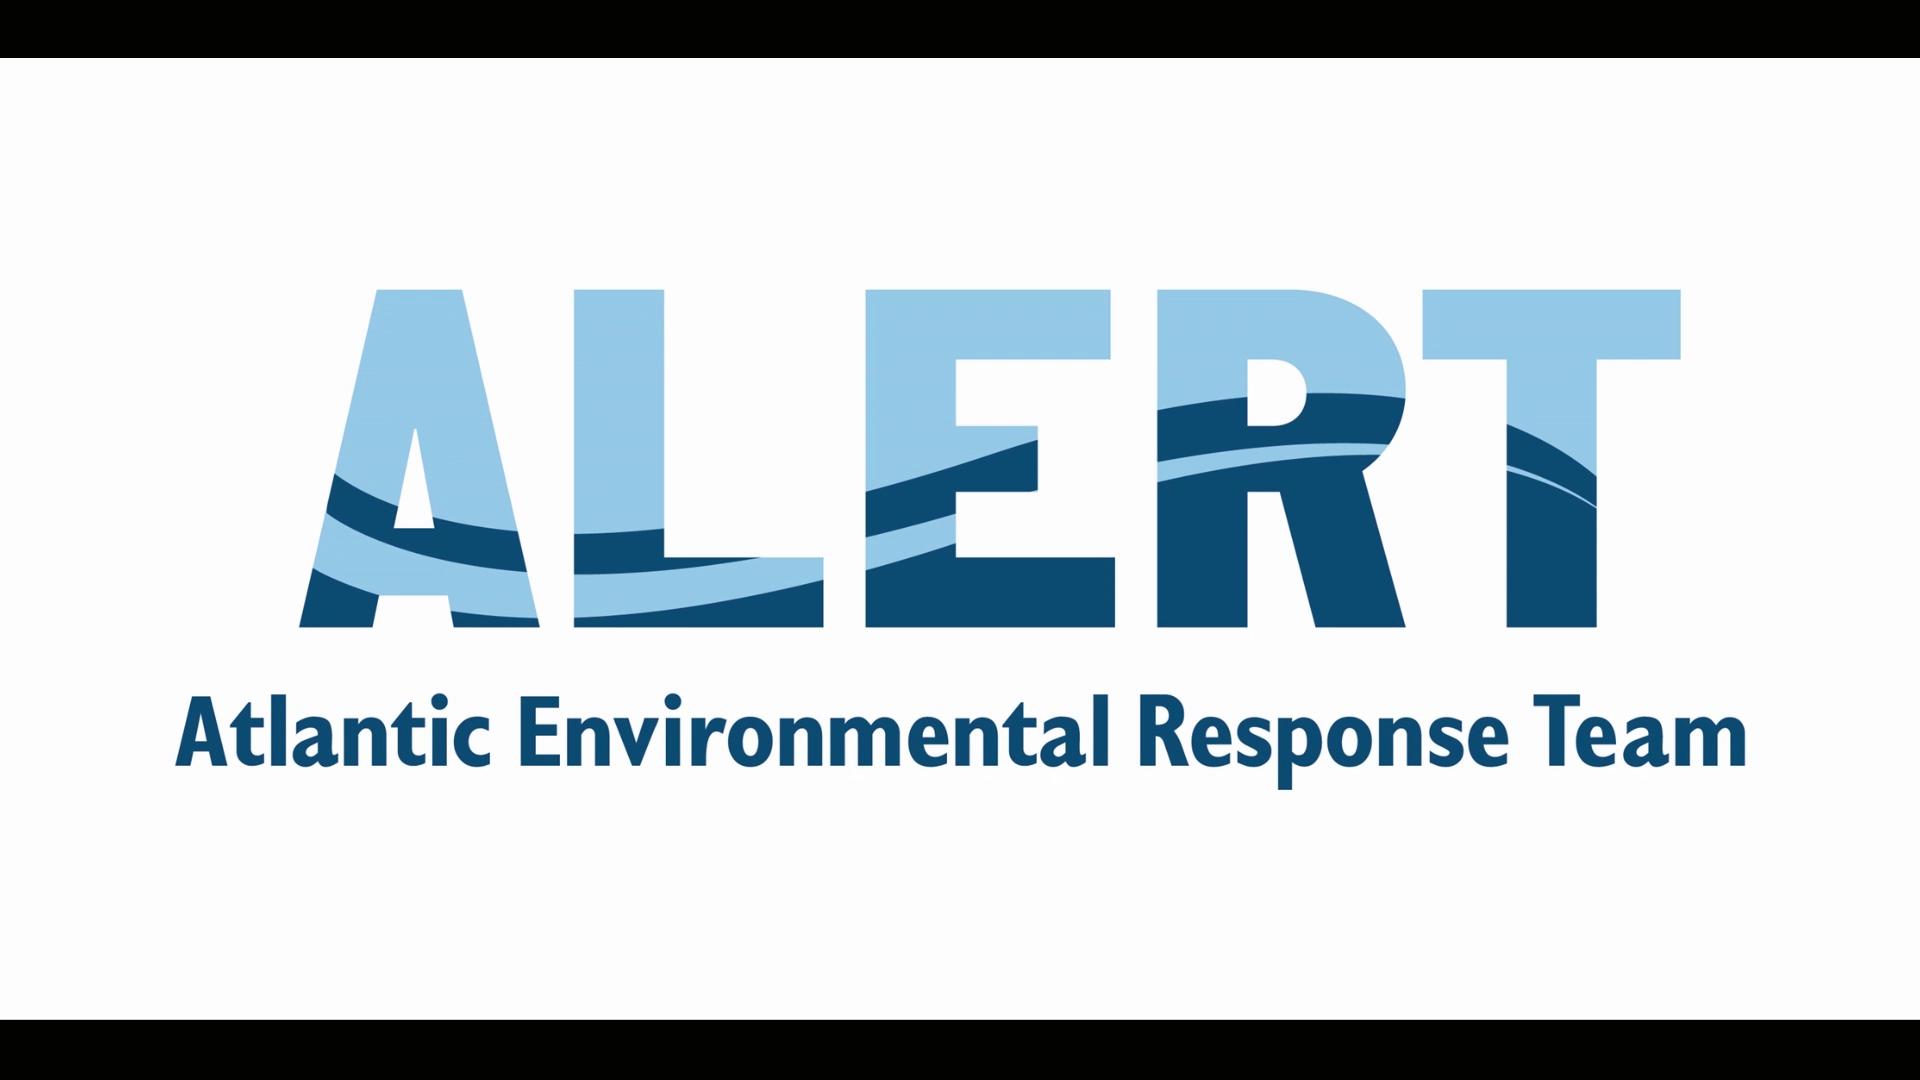 Atlantic Environmental Response Team logo